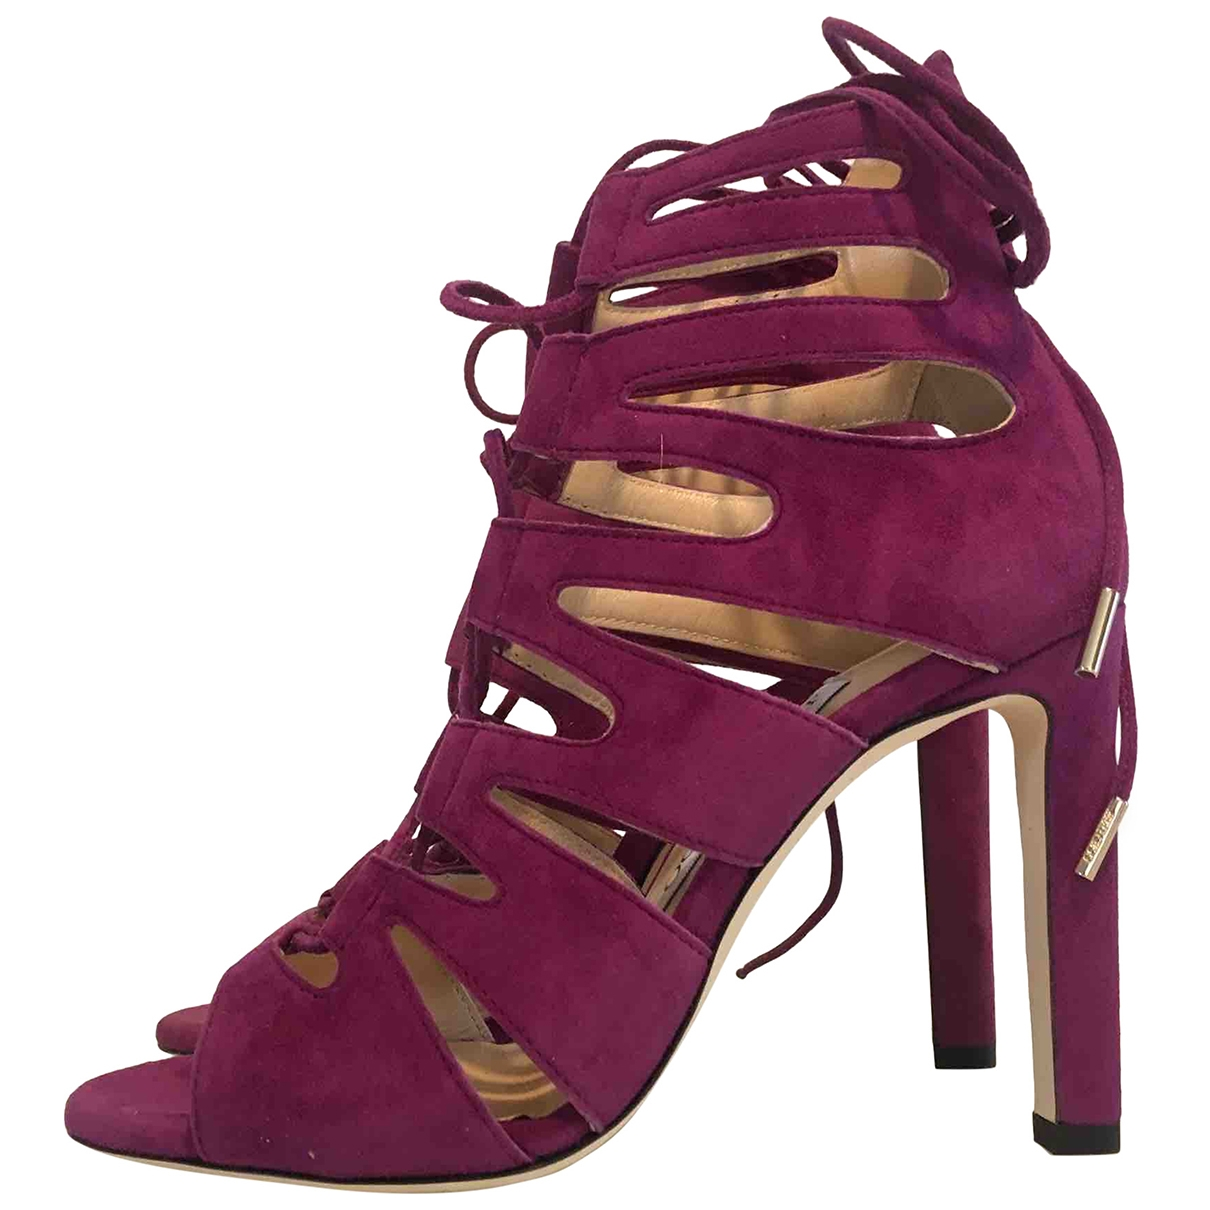 Jimmy Choo - Sandales   pour femme en suede - violet